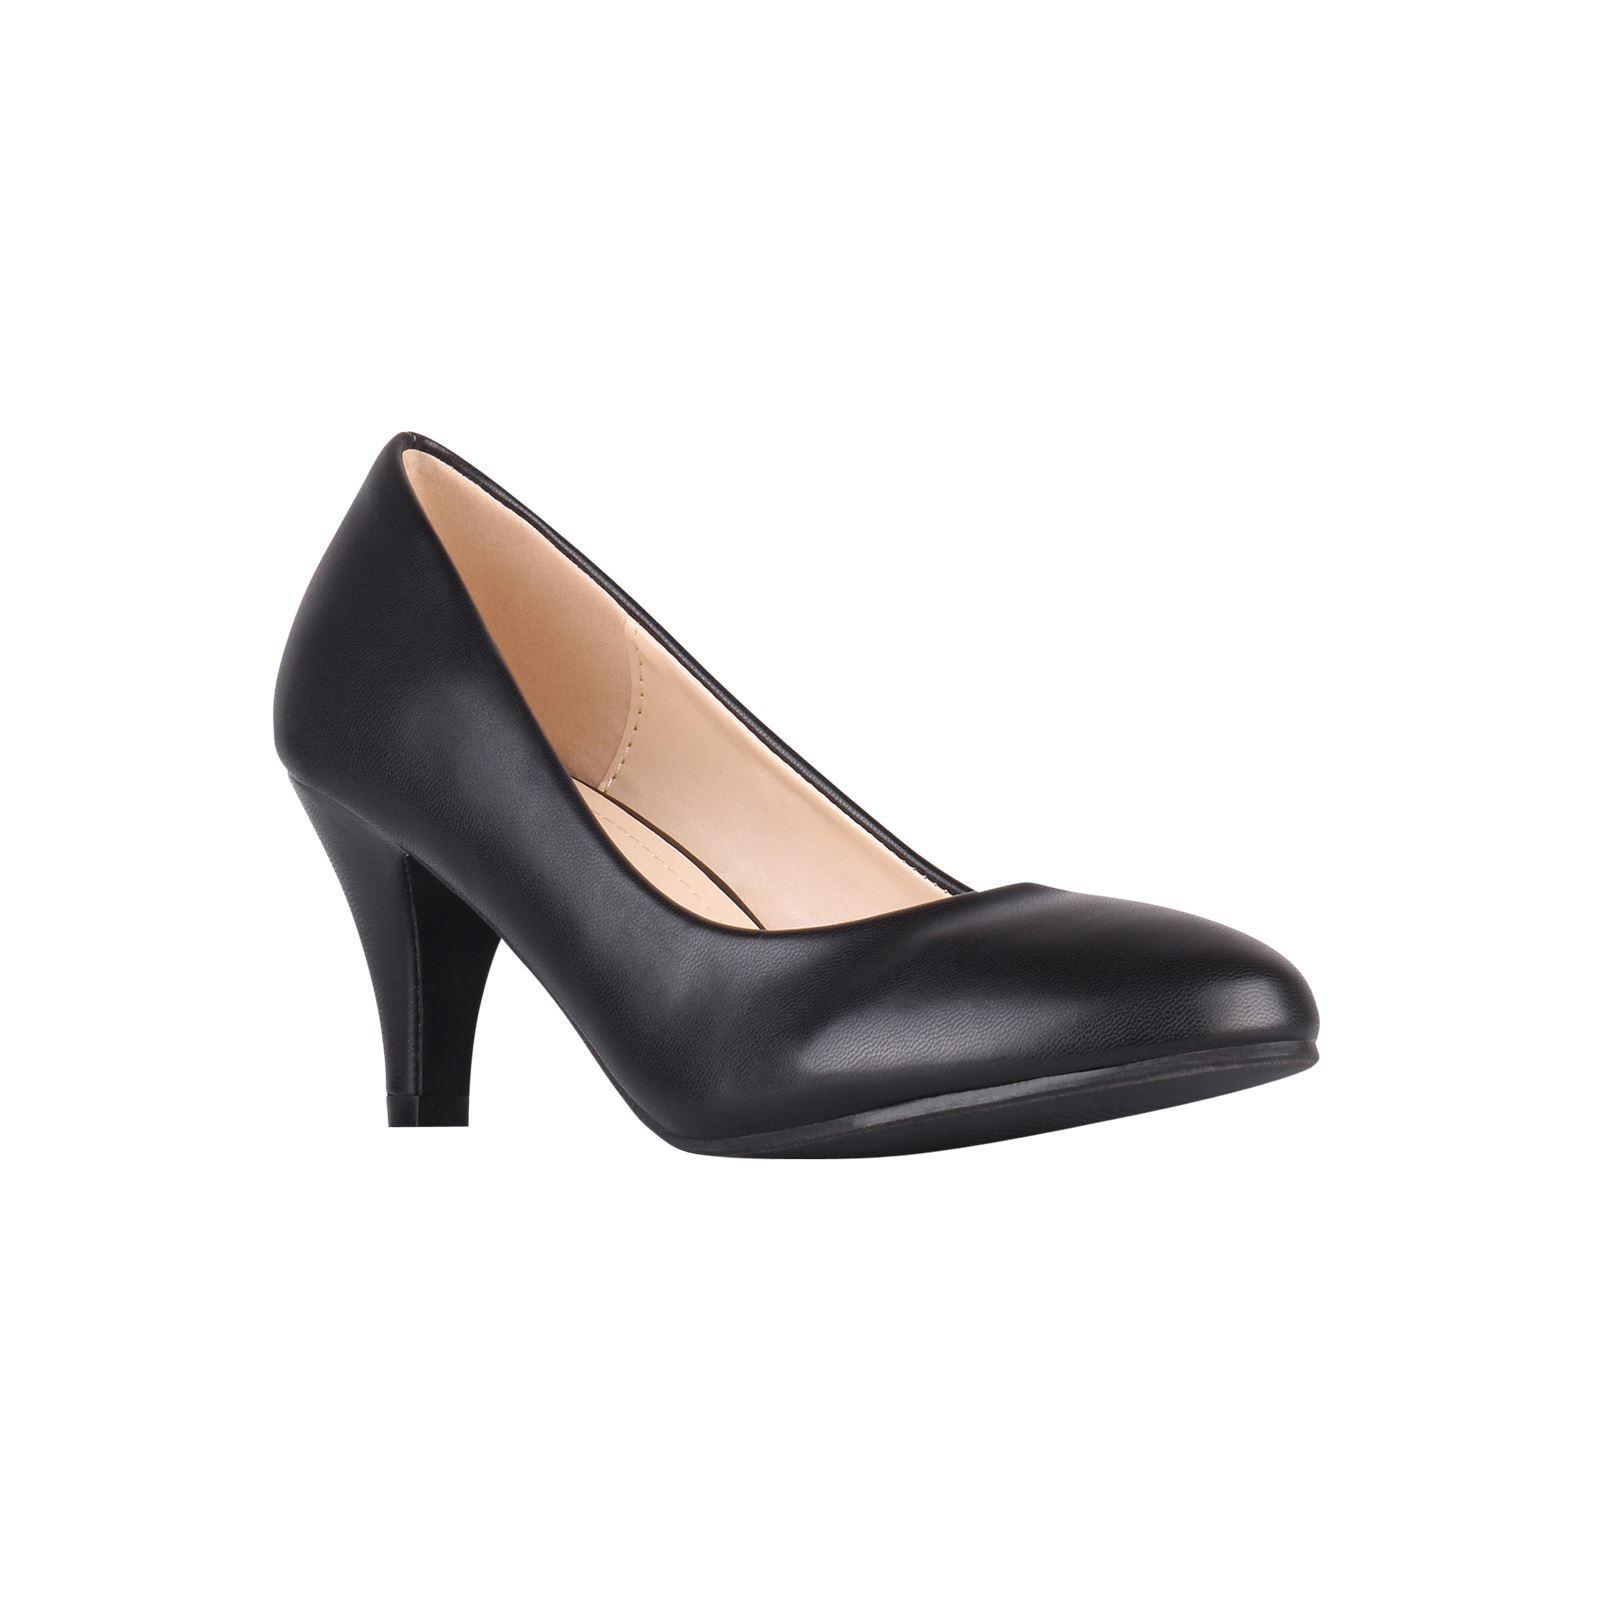 Womens-Ladies-Mid-Heel-Court-Shoes-Slip-On-Low-Kitten-Heels-Pumps-Matte-Size-3-8 thumbnail 10